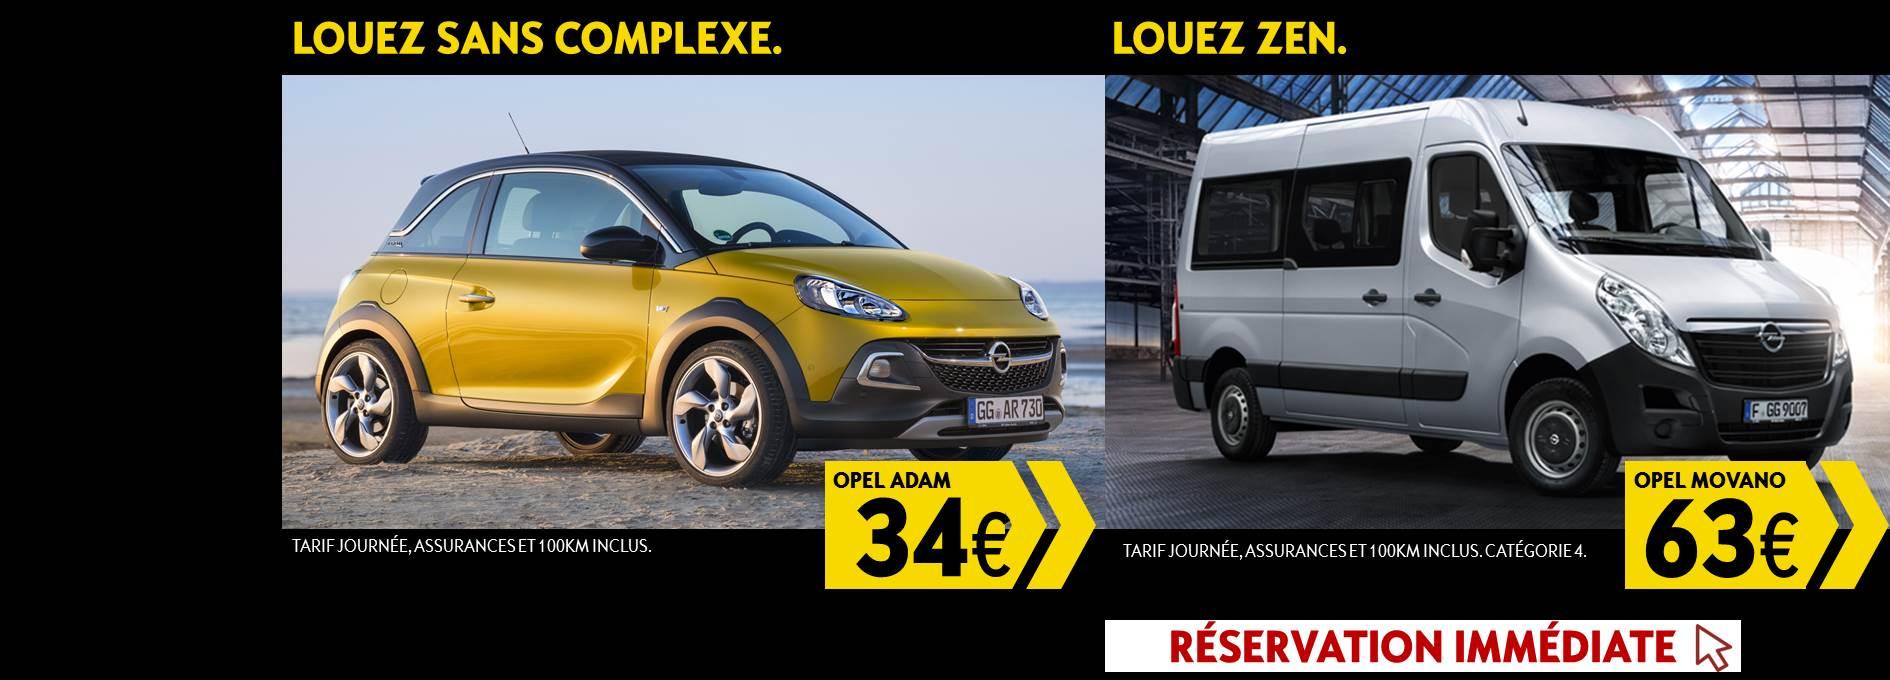 Opel orleans concessionnaire garage loiret 45 for Renault orleans garage